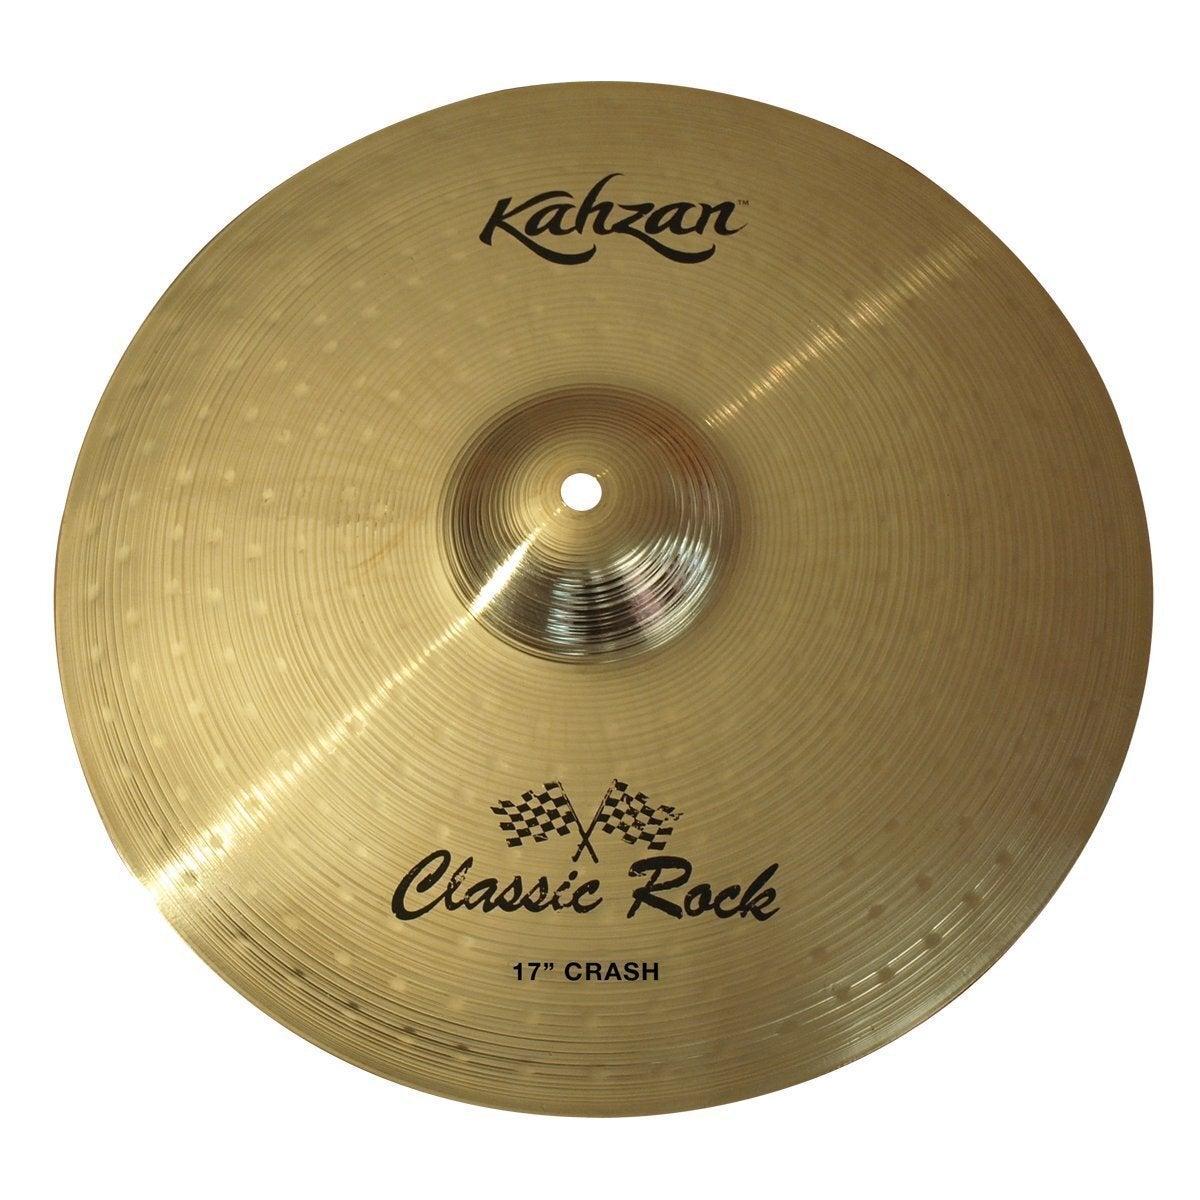 "Kahzan 'Classic Rock Series' Crash Cymbal 17"""